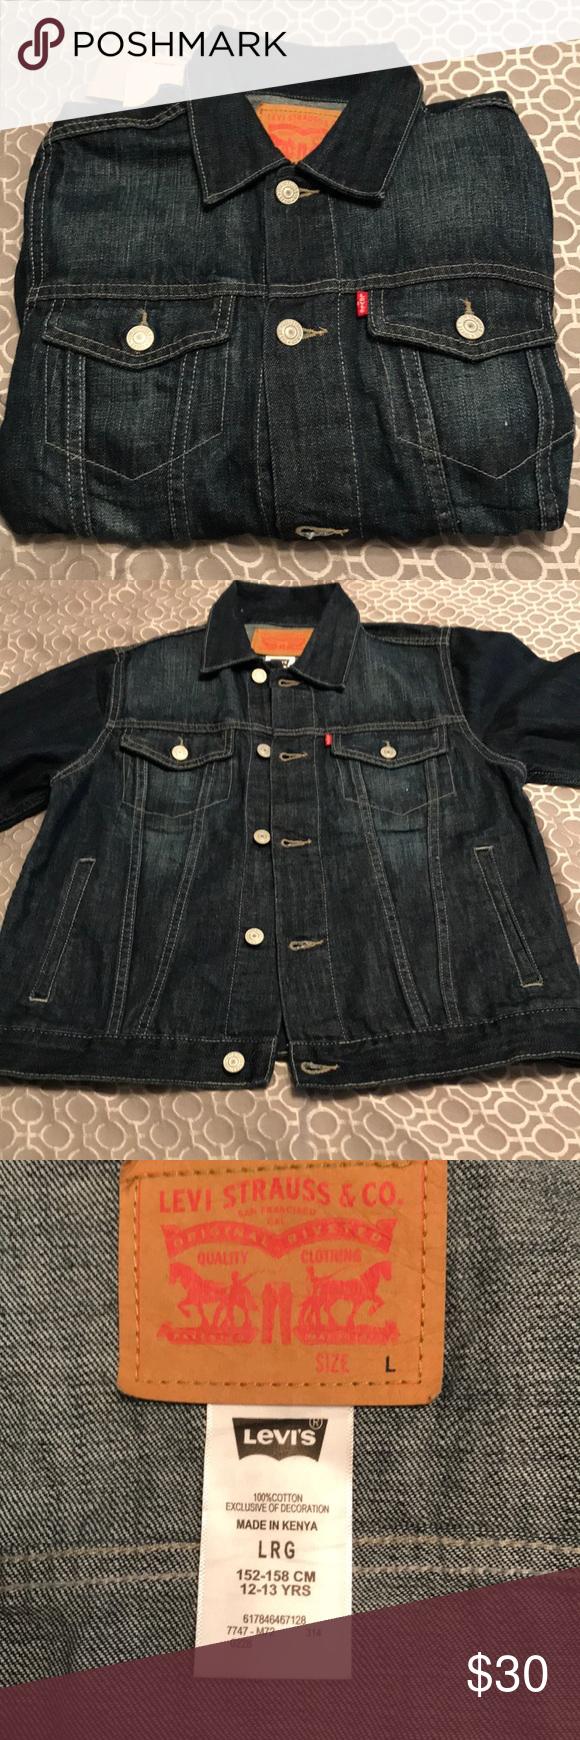 ed2c88bd4932 NWT Boys Levi s jean jacket. Size Large. NWT